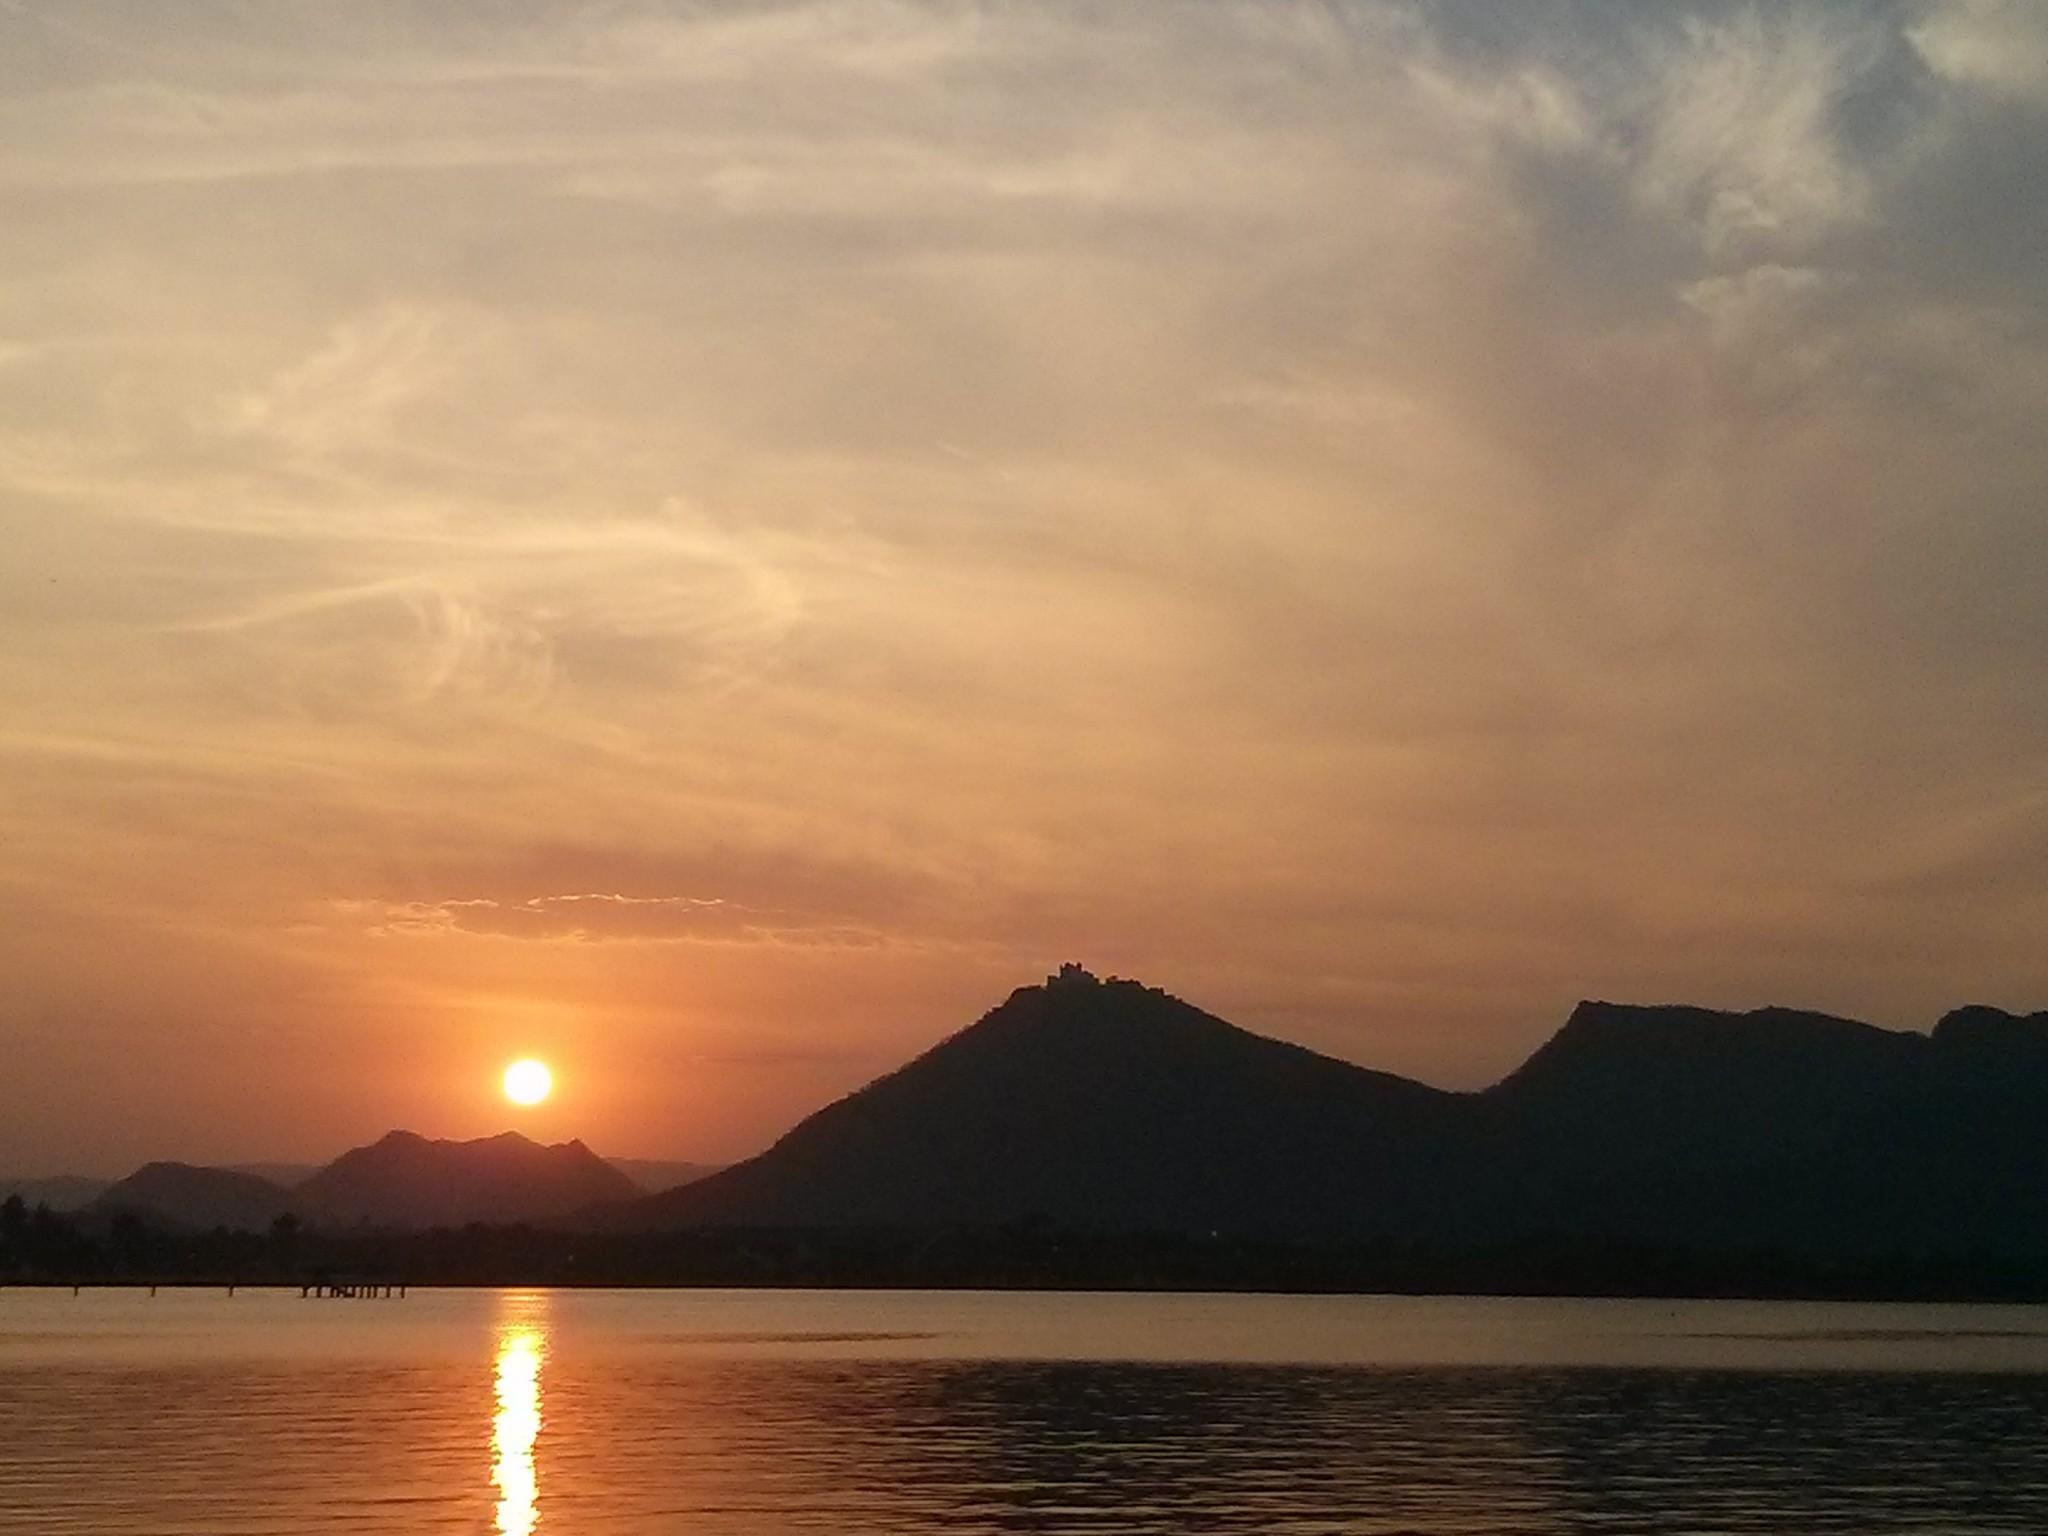 Lake_Fatehsagar